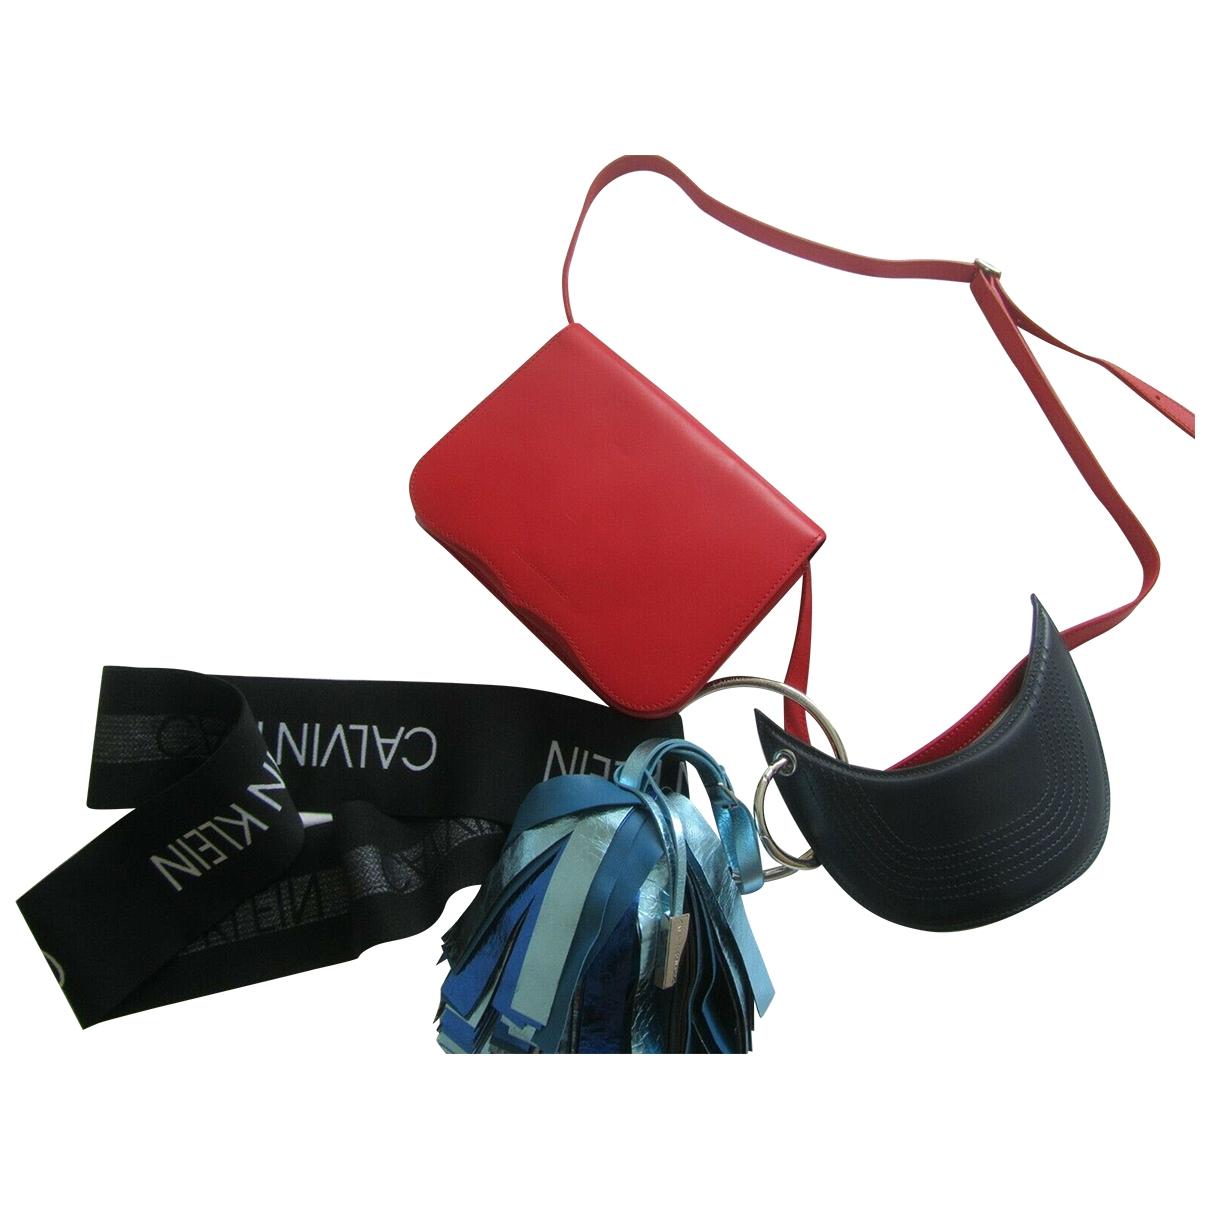 Calvin Klein 205w39nyc \N Multicolour Leather handbag for Women \N